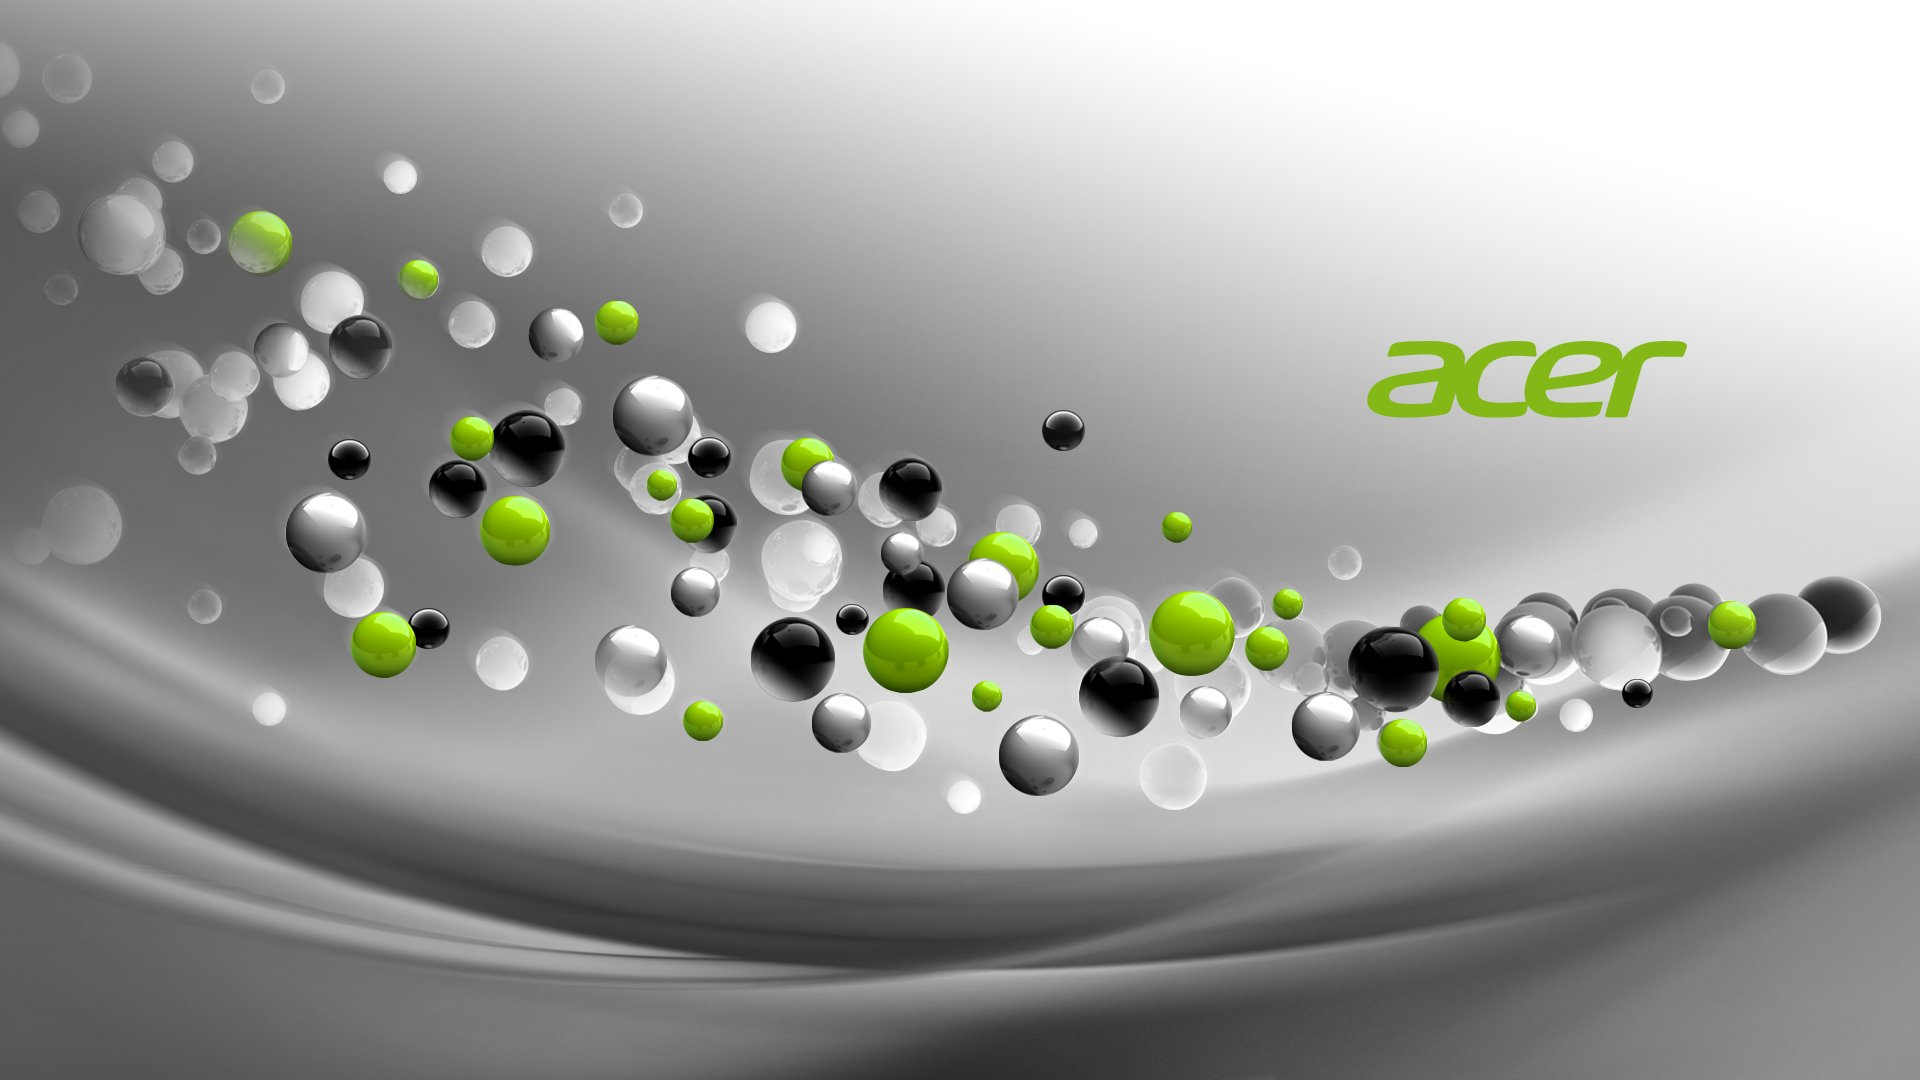 Acer Fond d'écran HD | Arrière-Plan | 1920x1080 | ID:757509 - Wallpaper Abyss